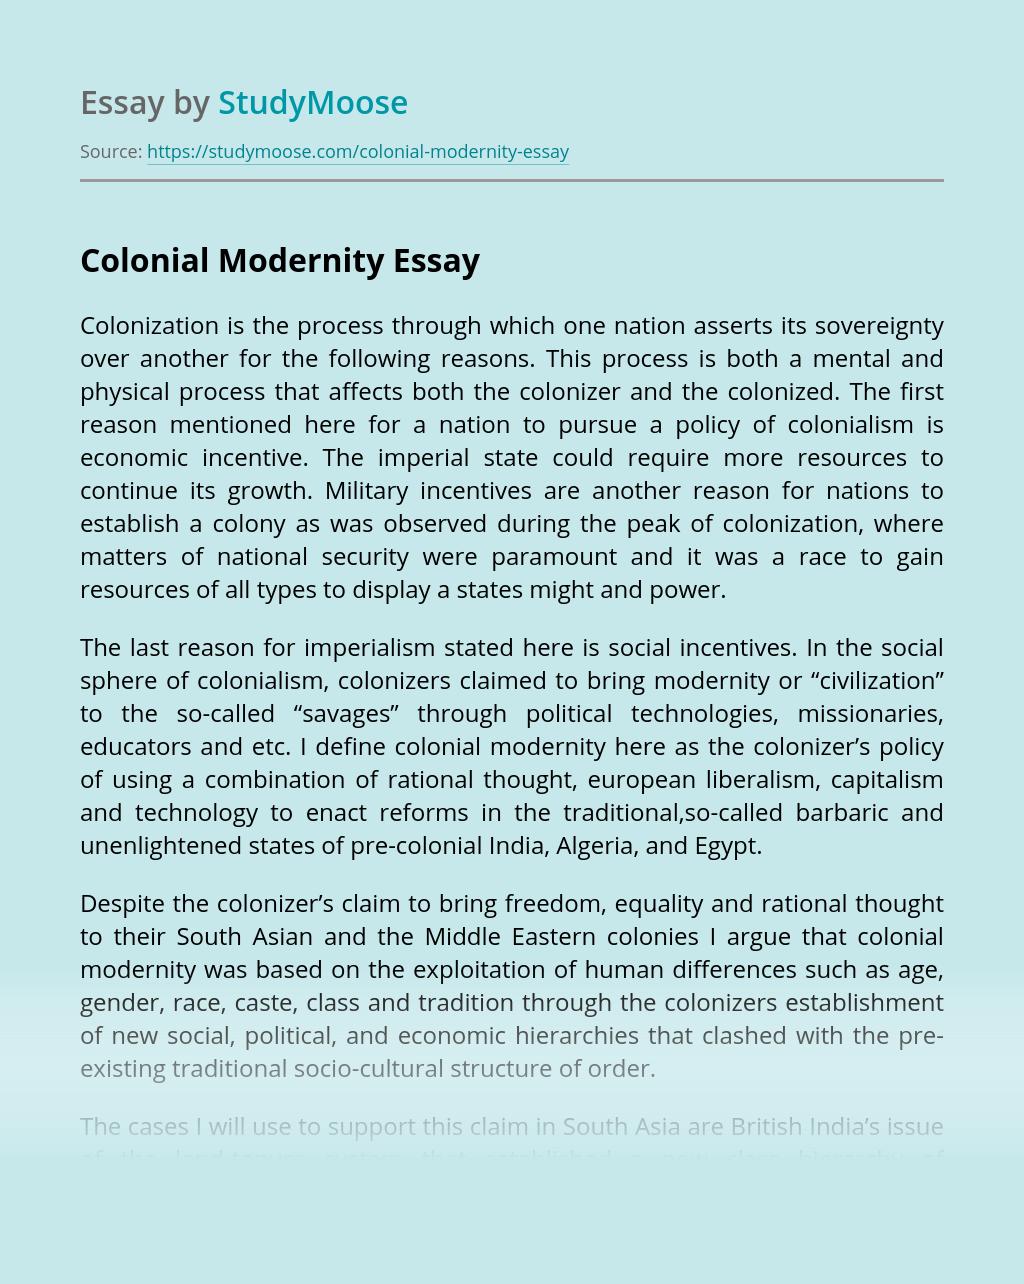 Colonial Modernity